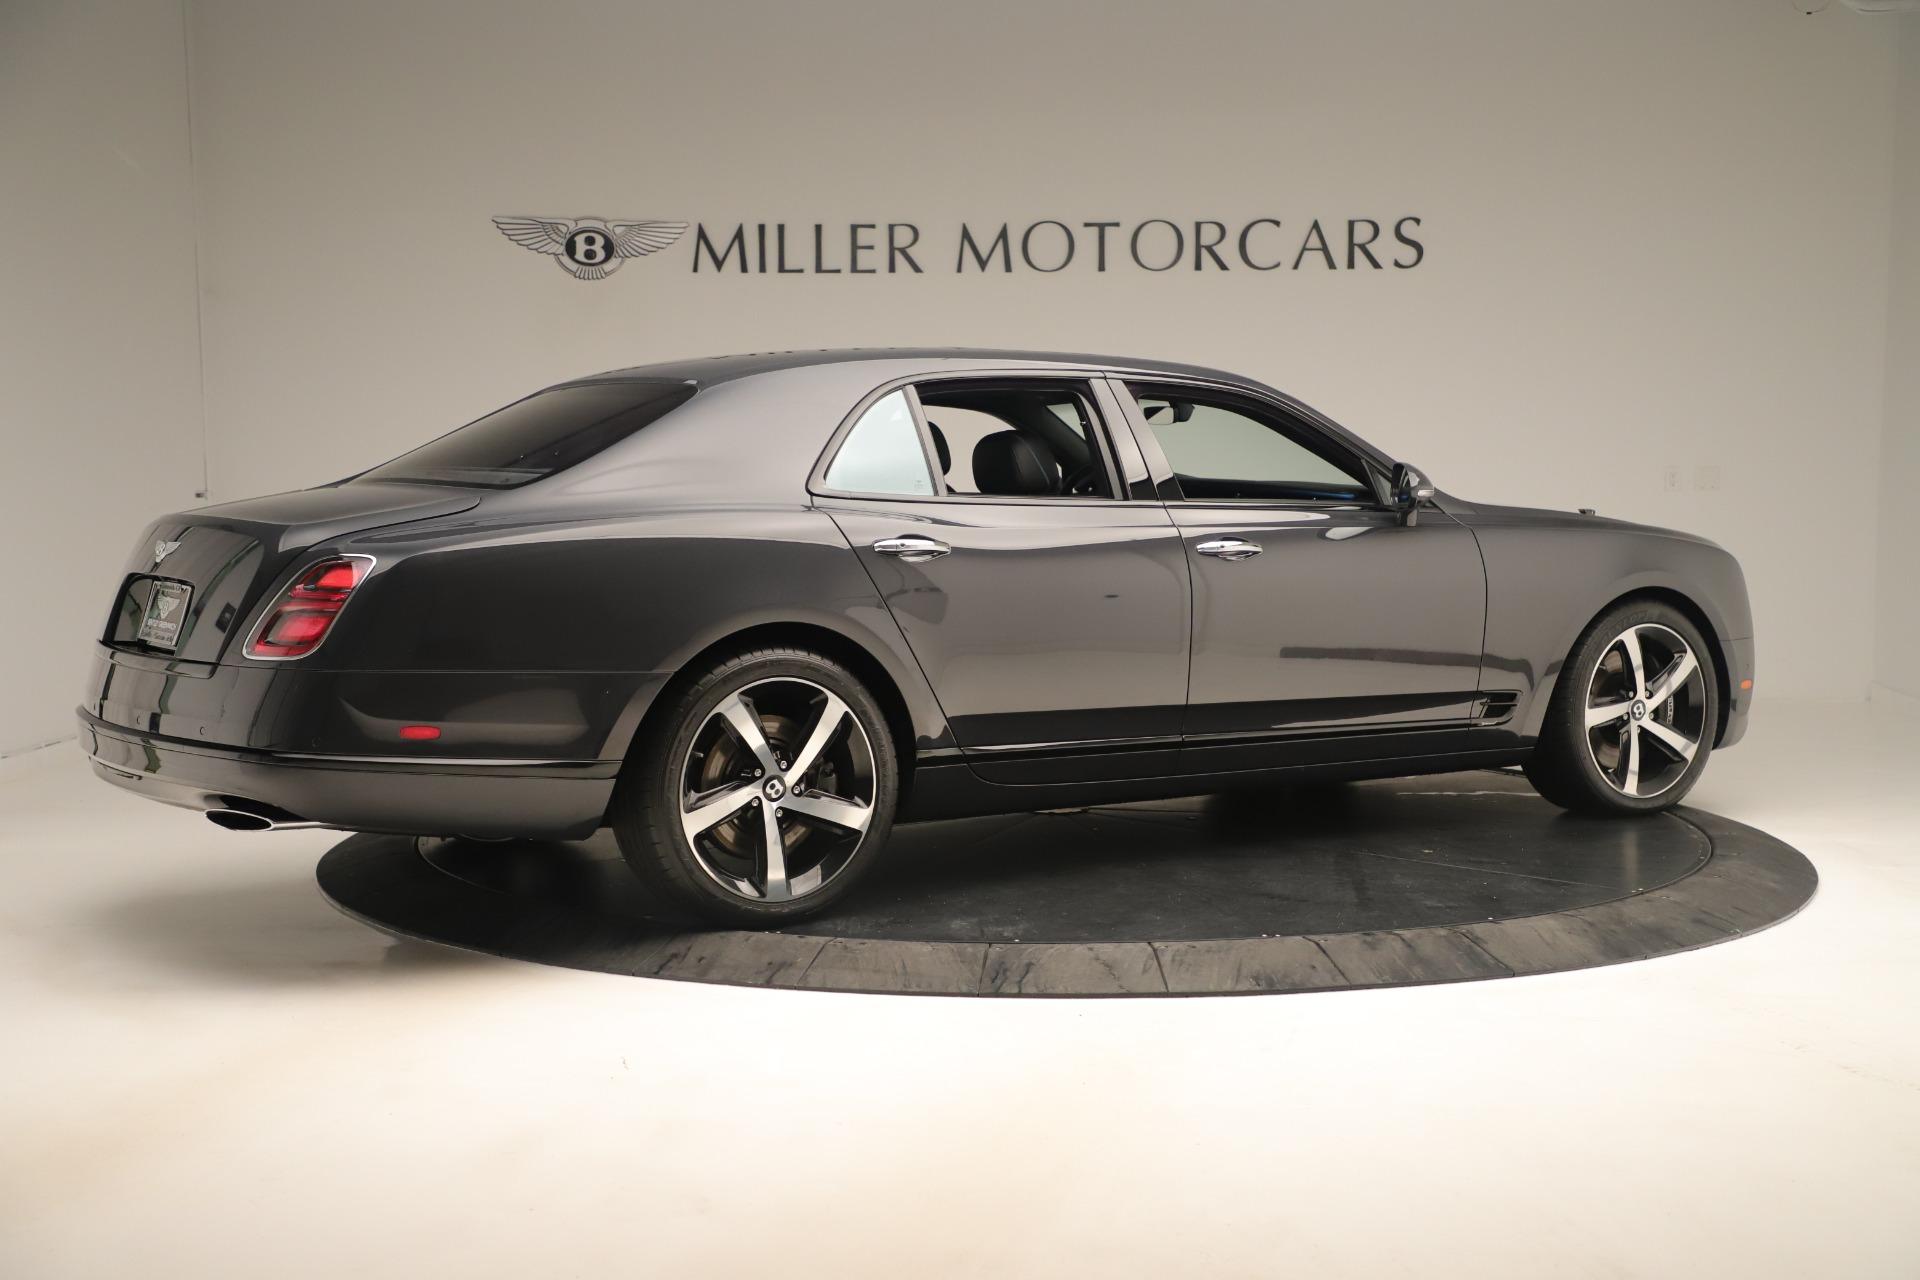 Used 2018 Bentley Mulsanne Speed Design Series For Sale In Westport, CT 3405_p8